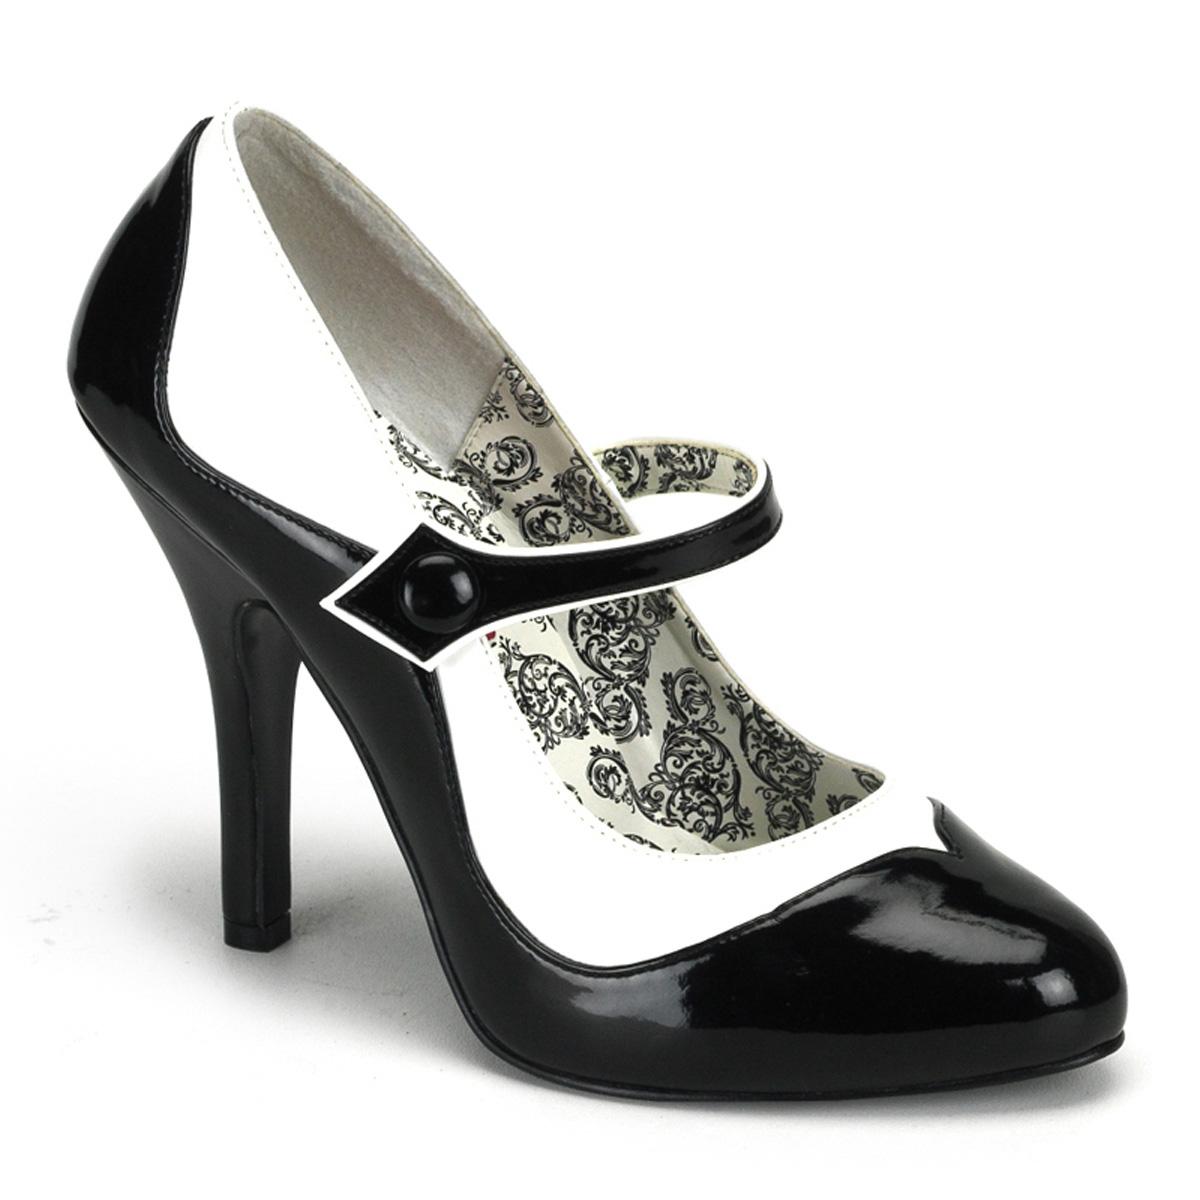 Prices For Sale Cheap Purchase Bordello Tempt 07(Women's) -Black/White PU Best Choice lUIutDIr